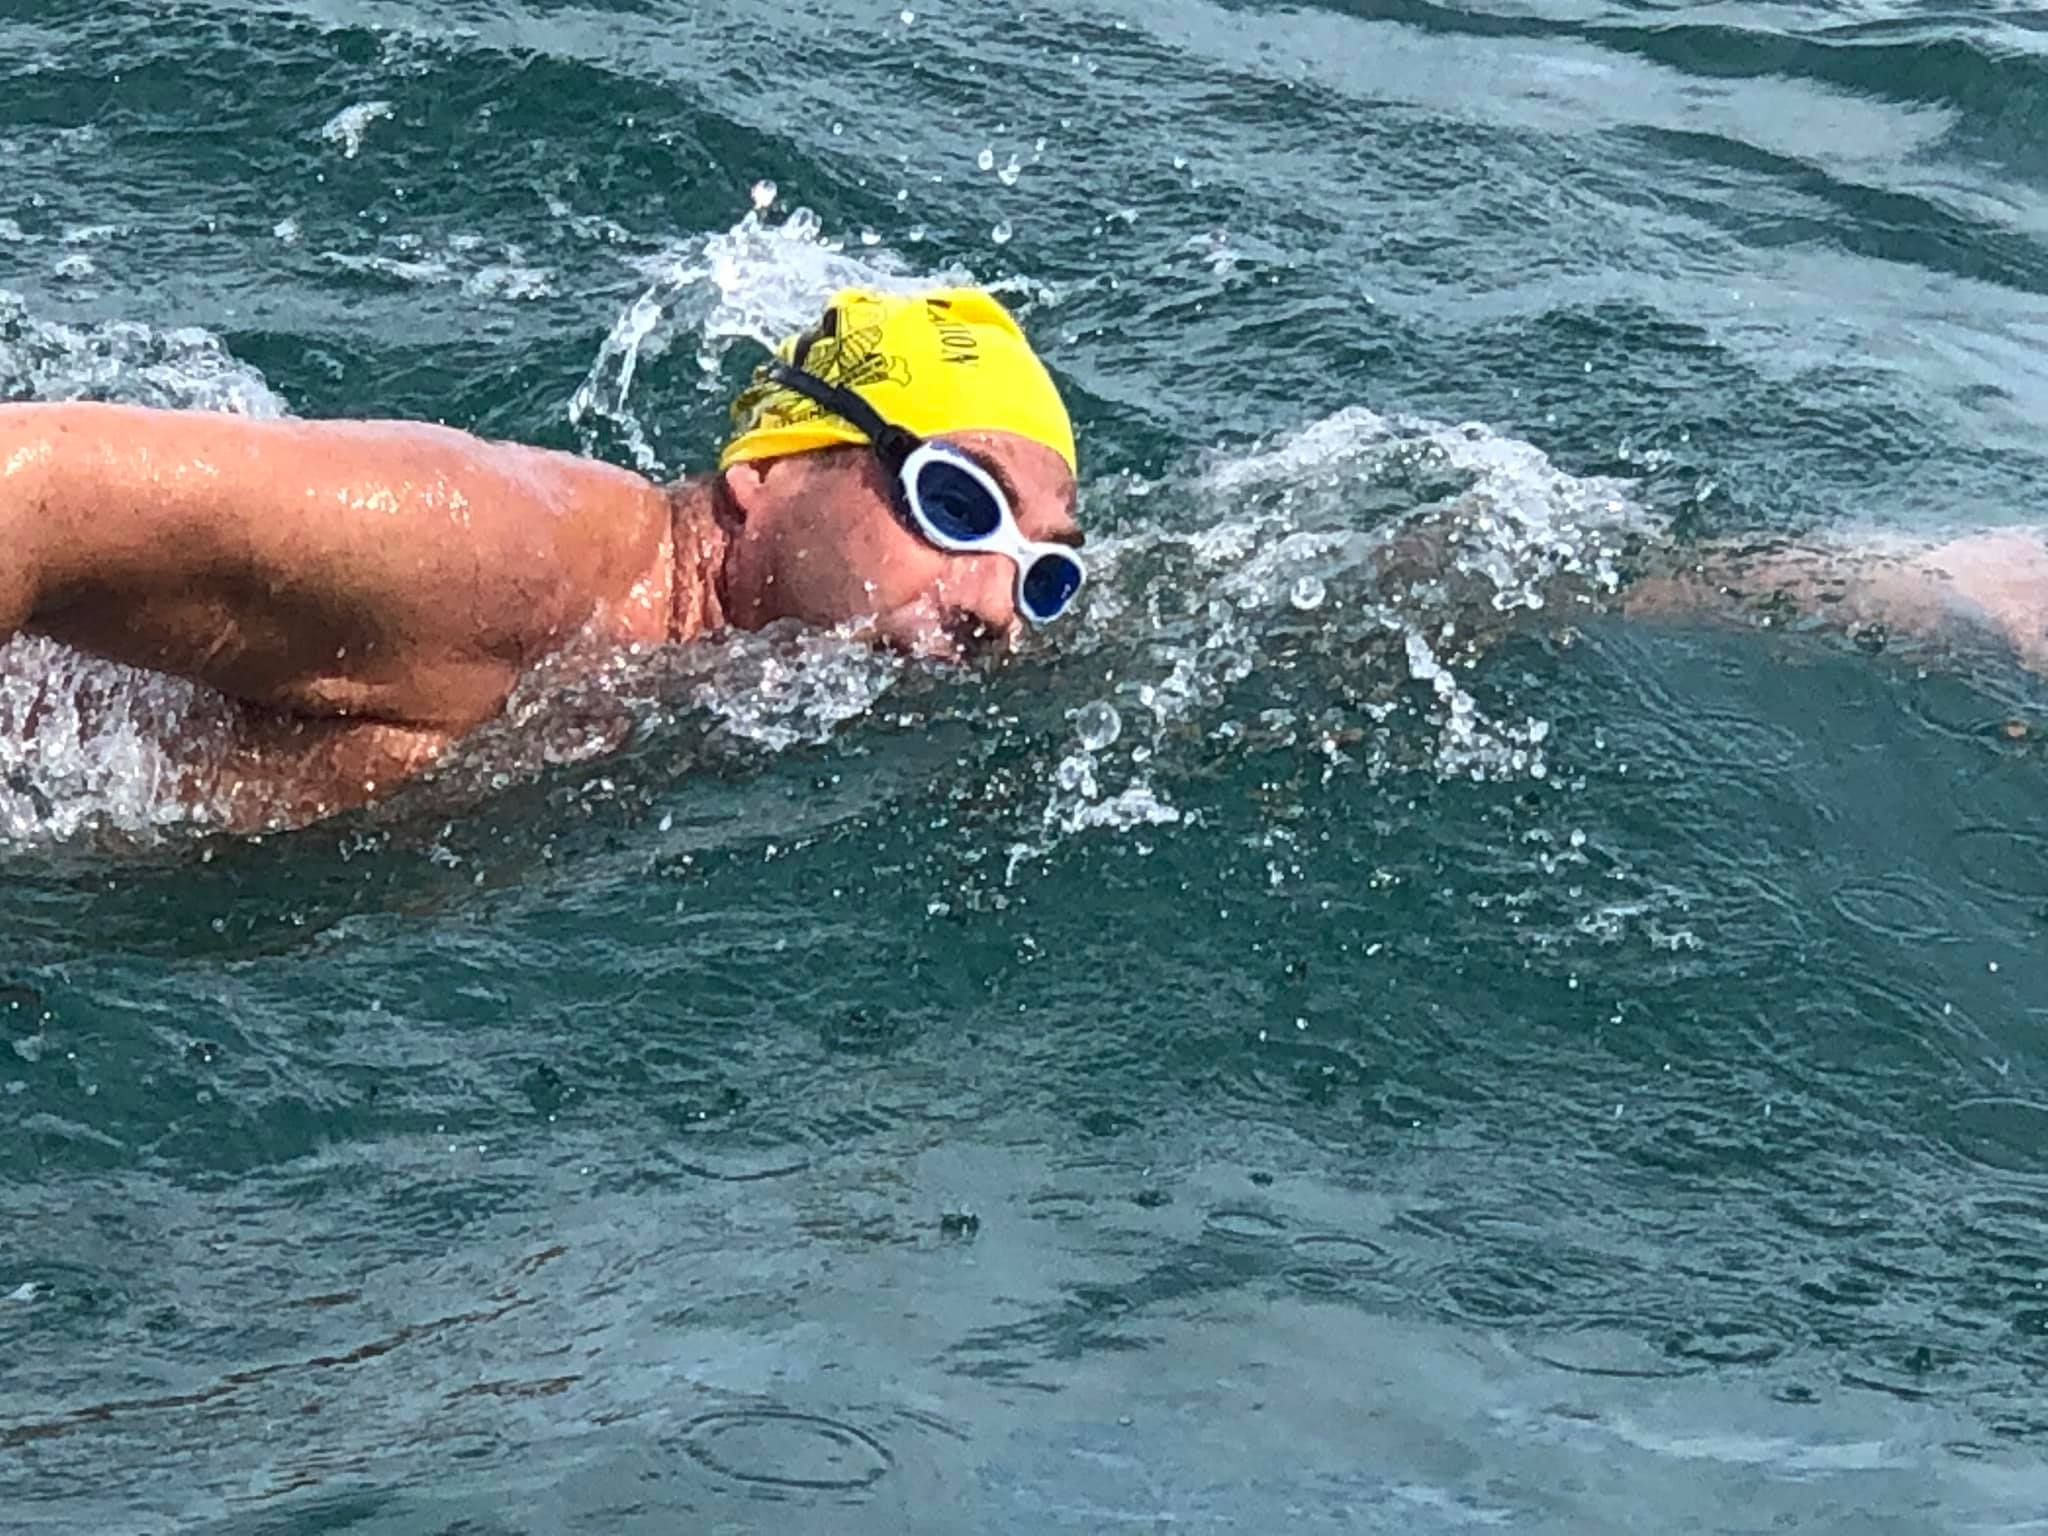 David Sanger swimming the channel for Treloar's